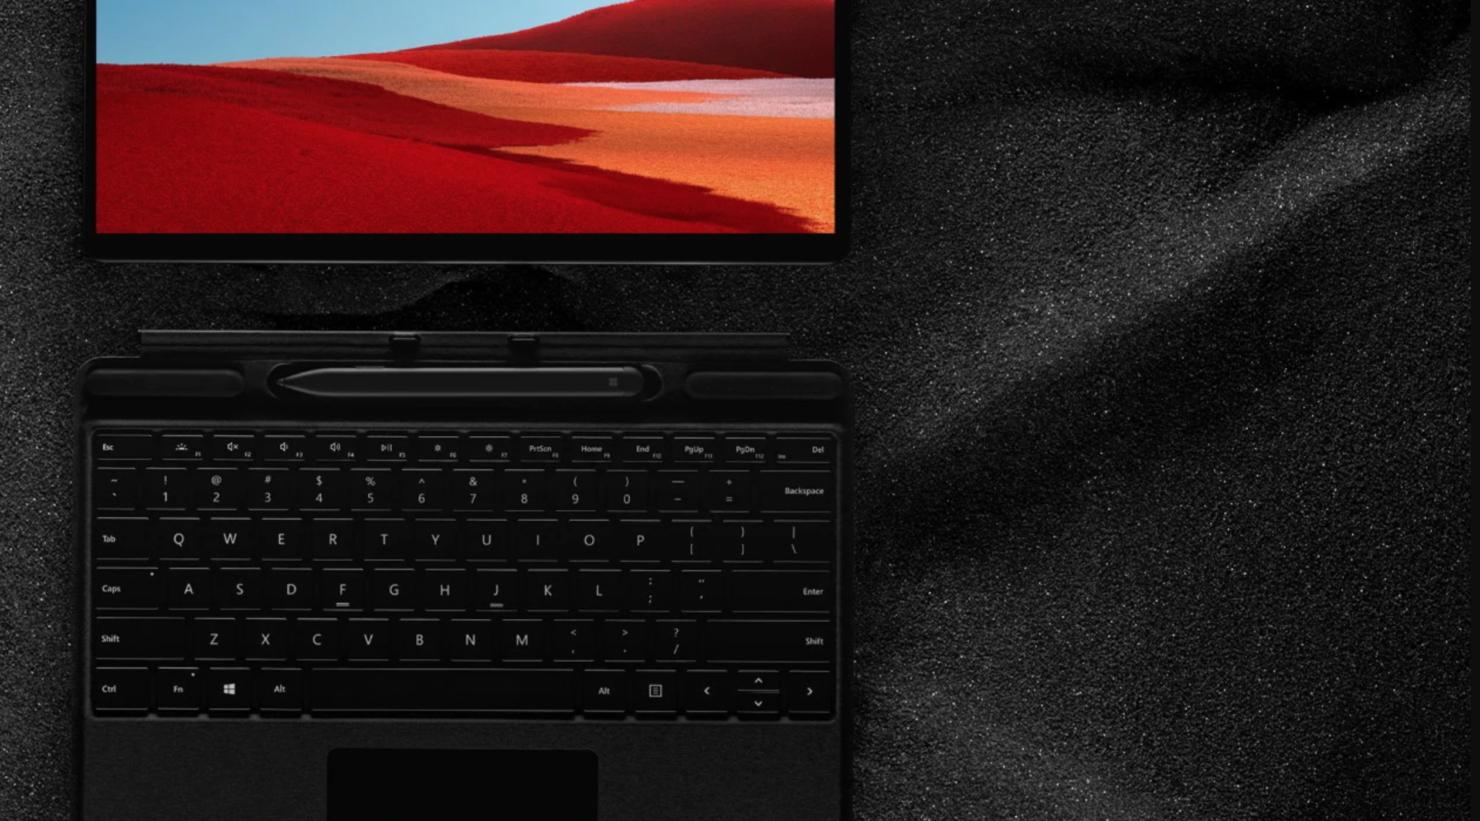 surface pro x firmware updates Windows 10 on ARM